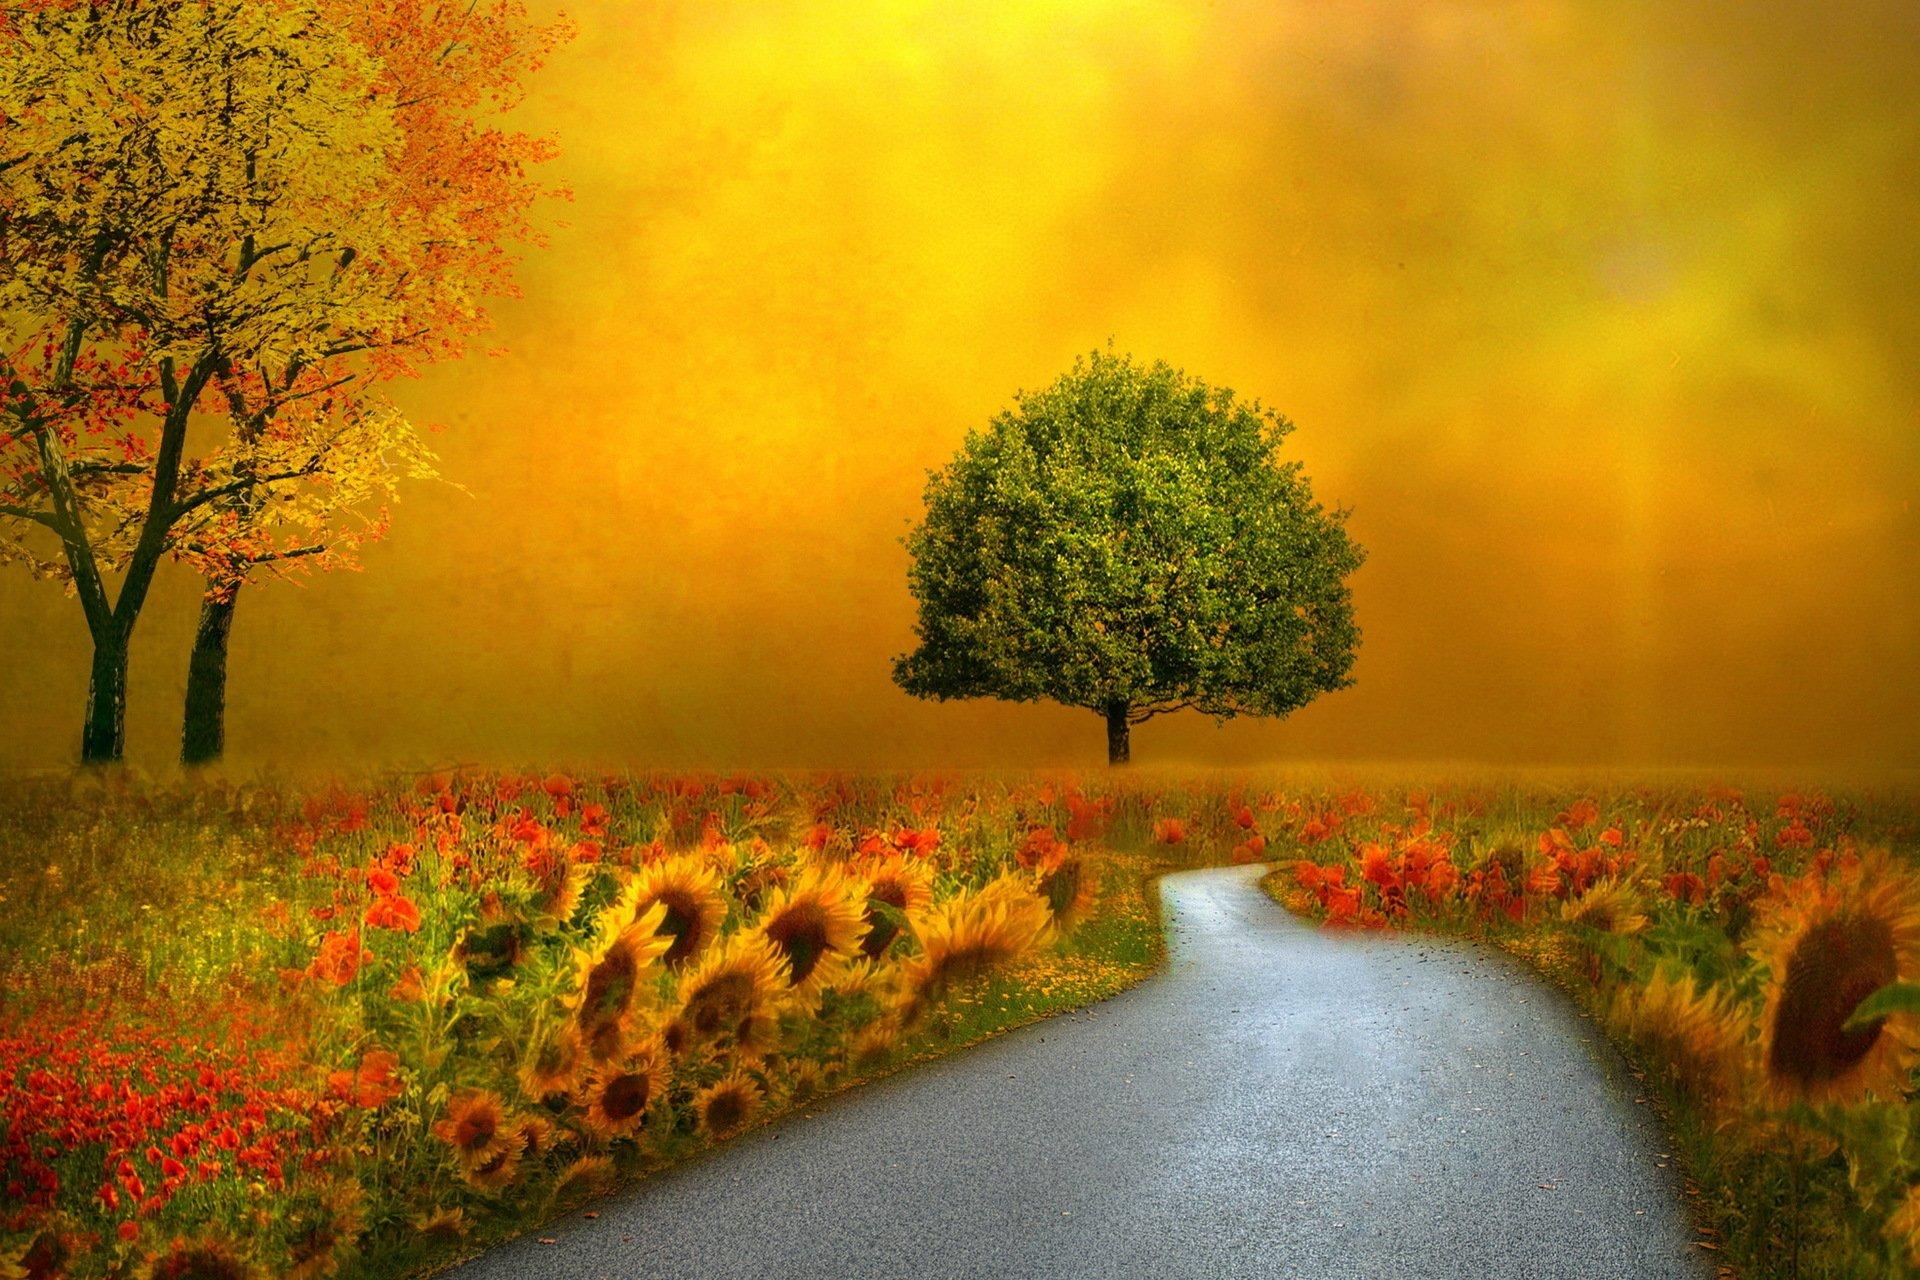 Artistic - Tree  Artistic Fantasy Road Flower Sunset Field Wallpaper